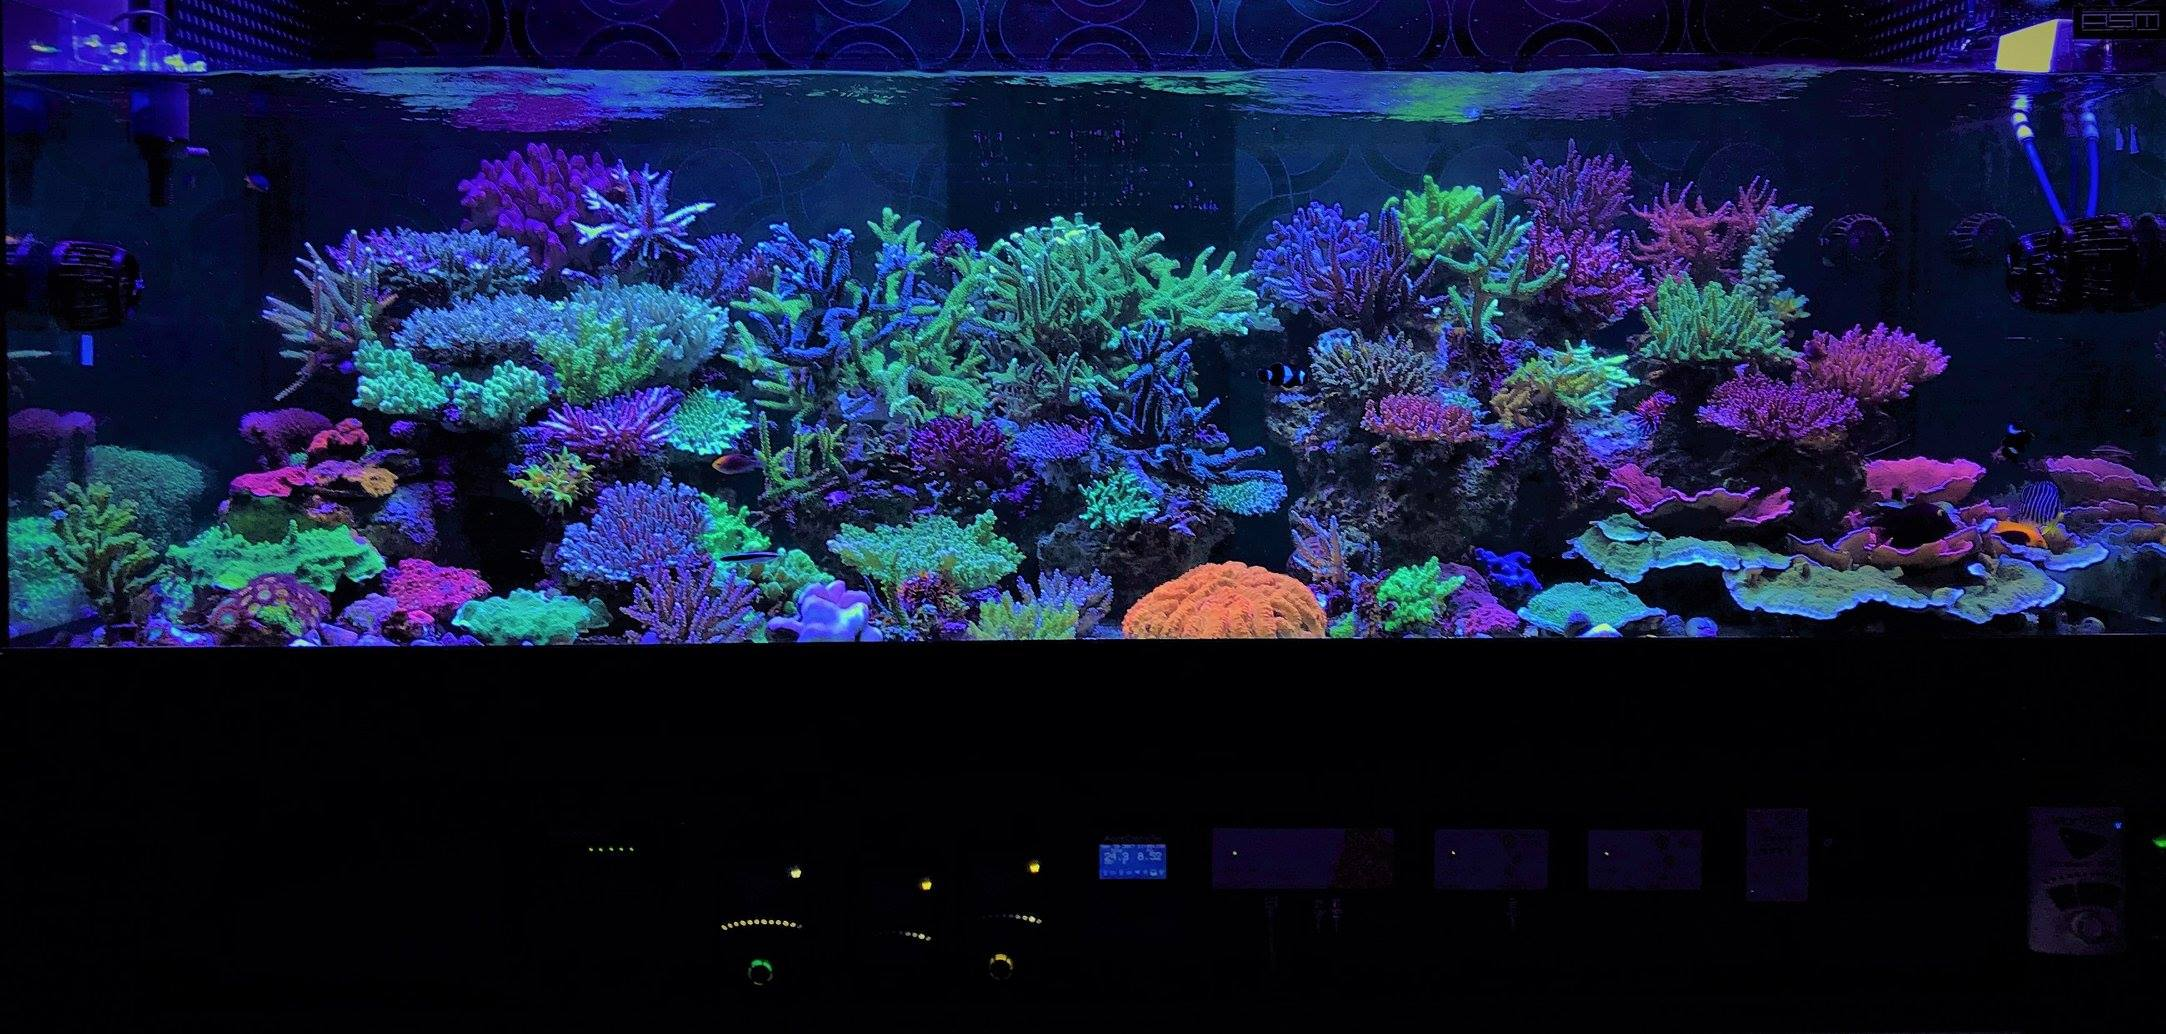 coral gallery unter riff aquarium led orphek aquarium led beleuchtung. Black Bedroom Furniture Sets. Home Design Ideas